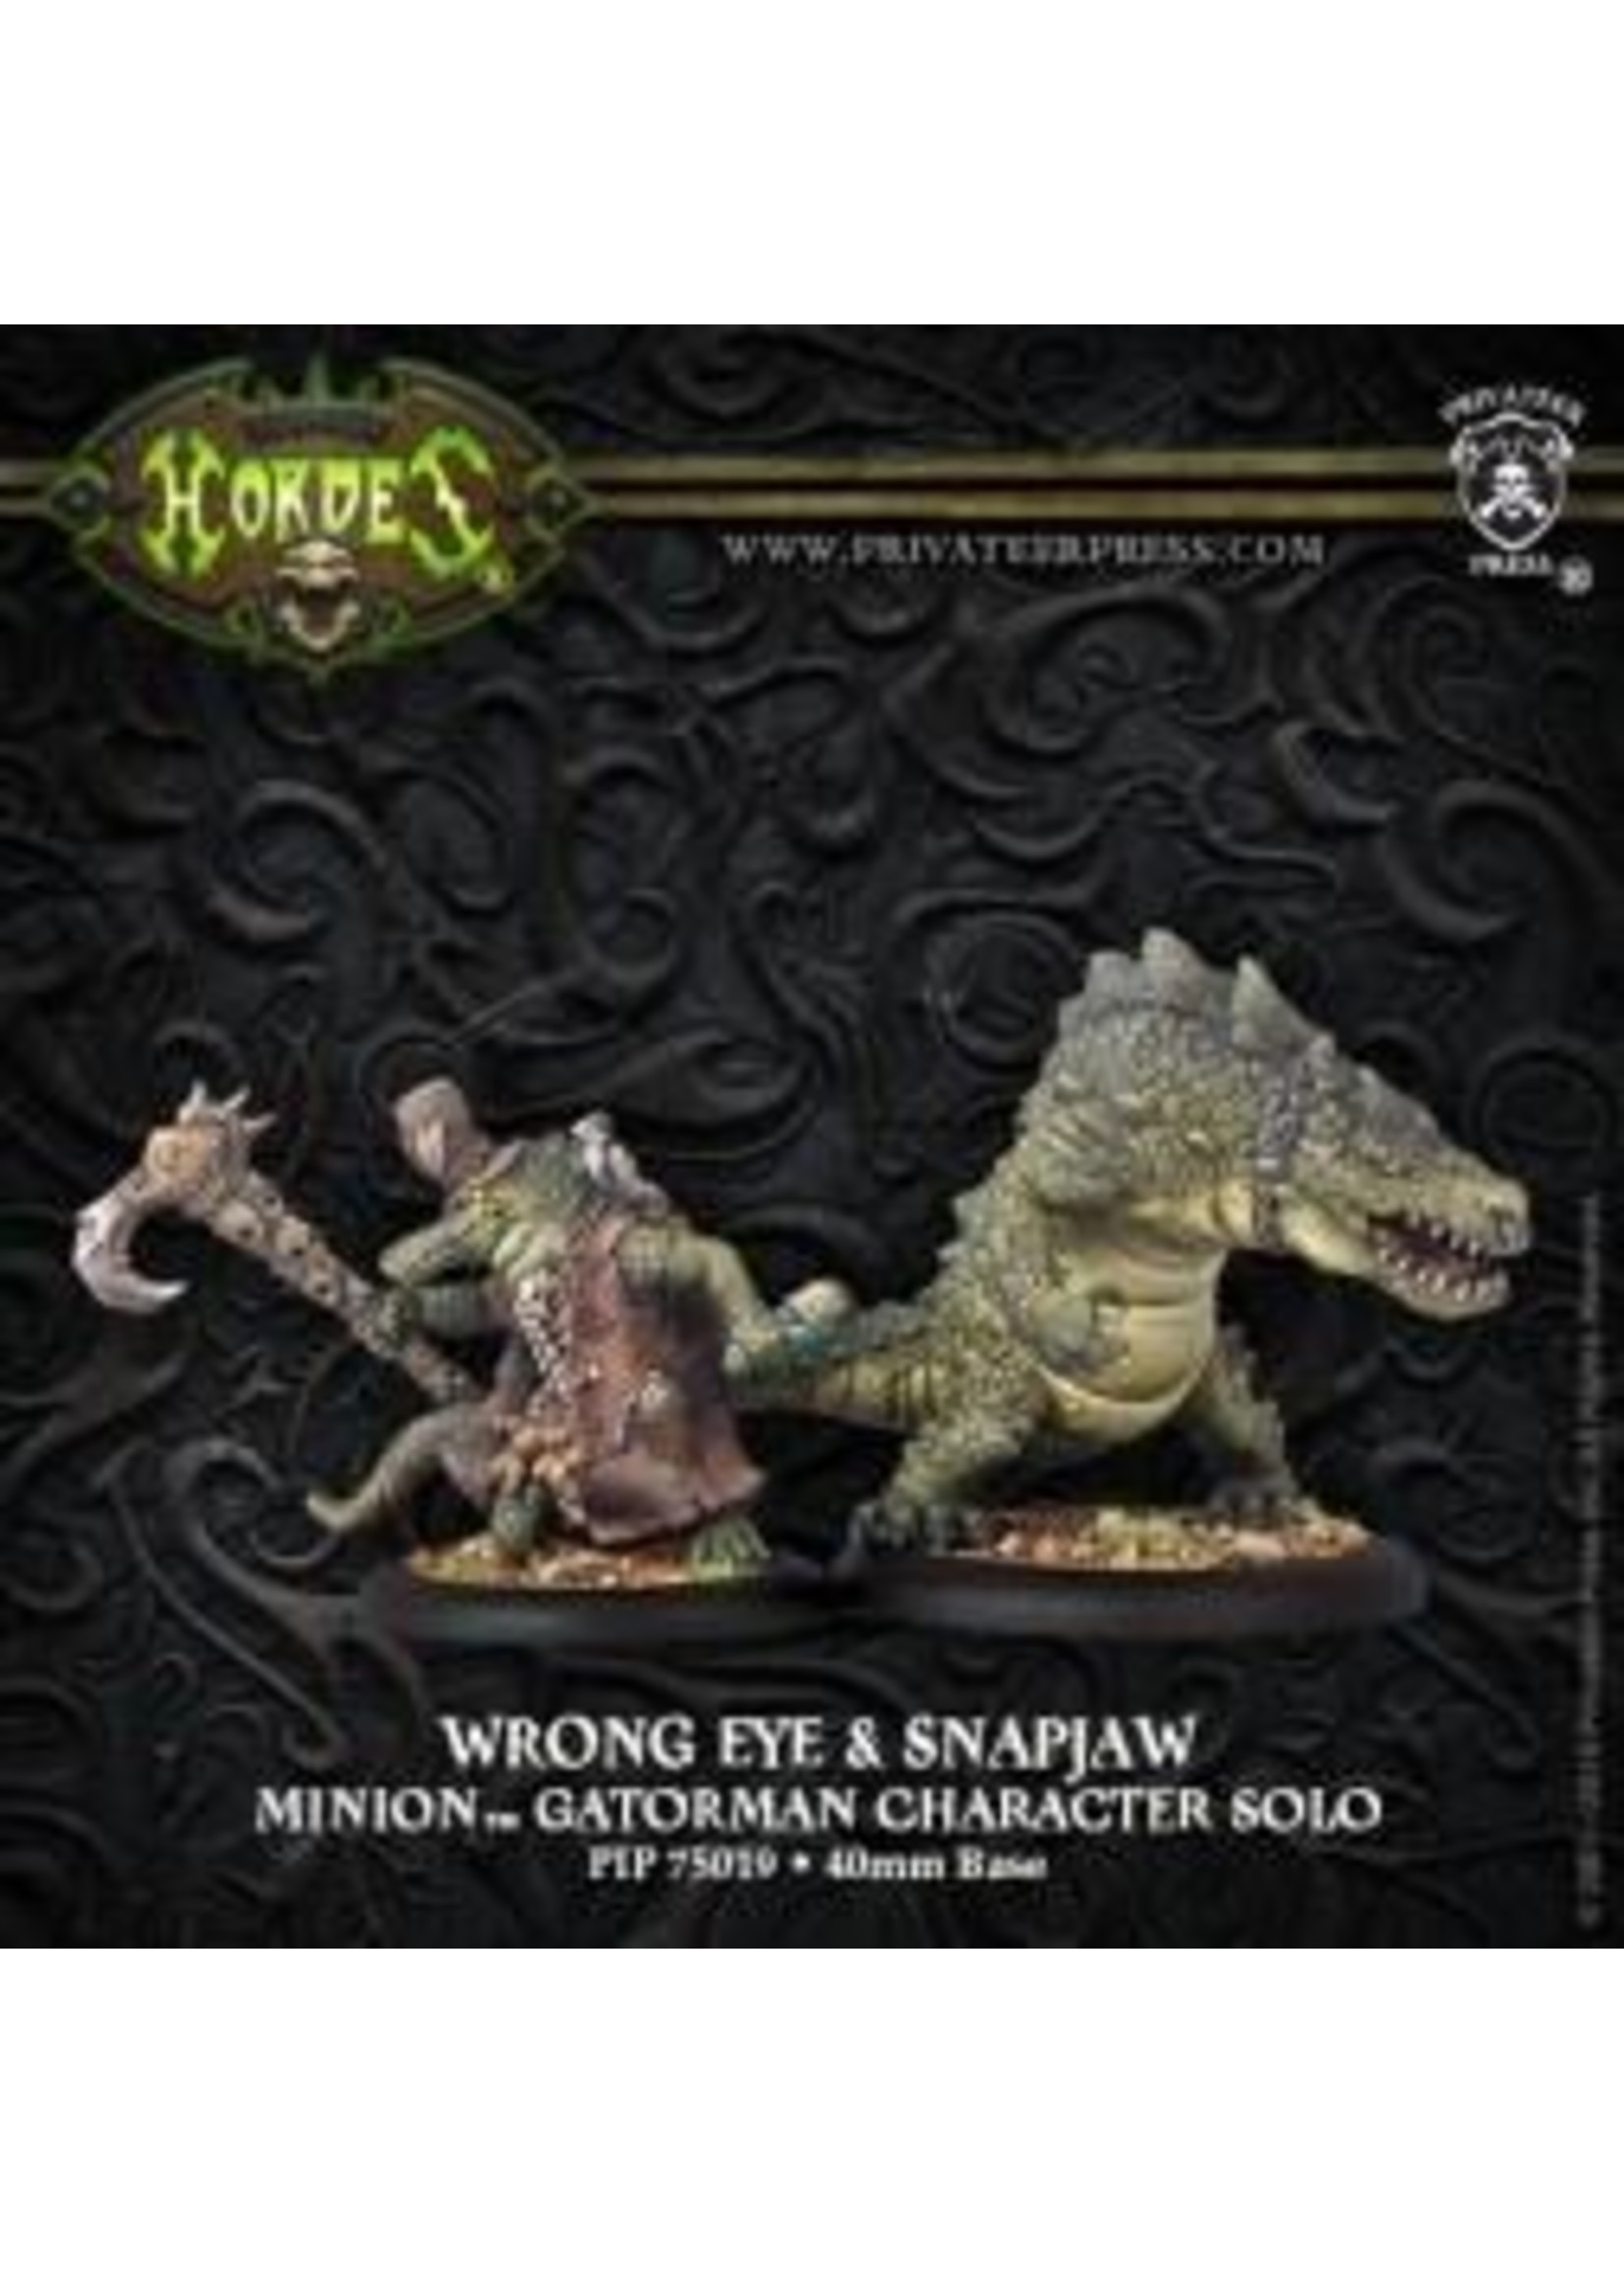 Hordes: Minions Wrong Eye and Snapjaw Minion Gatorman Character Solo and Mercenary Minion Gatorman Character Heavy Warbeast (White Metal)